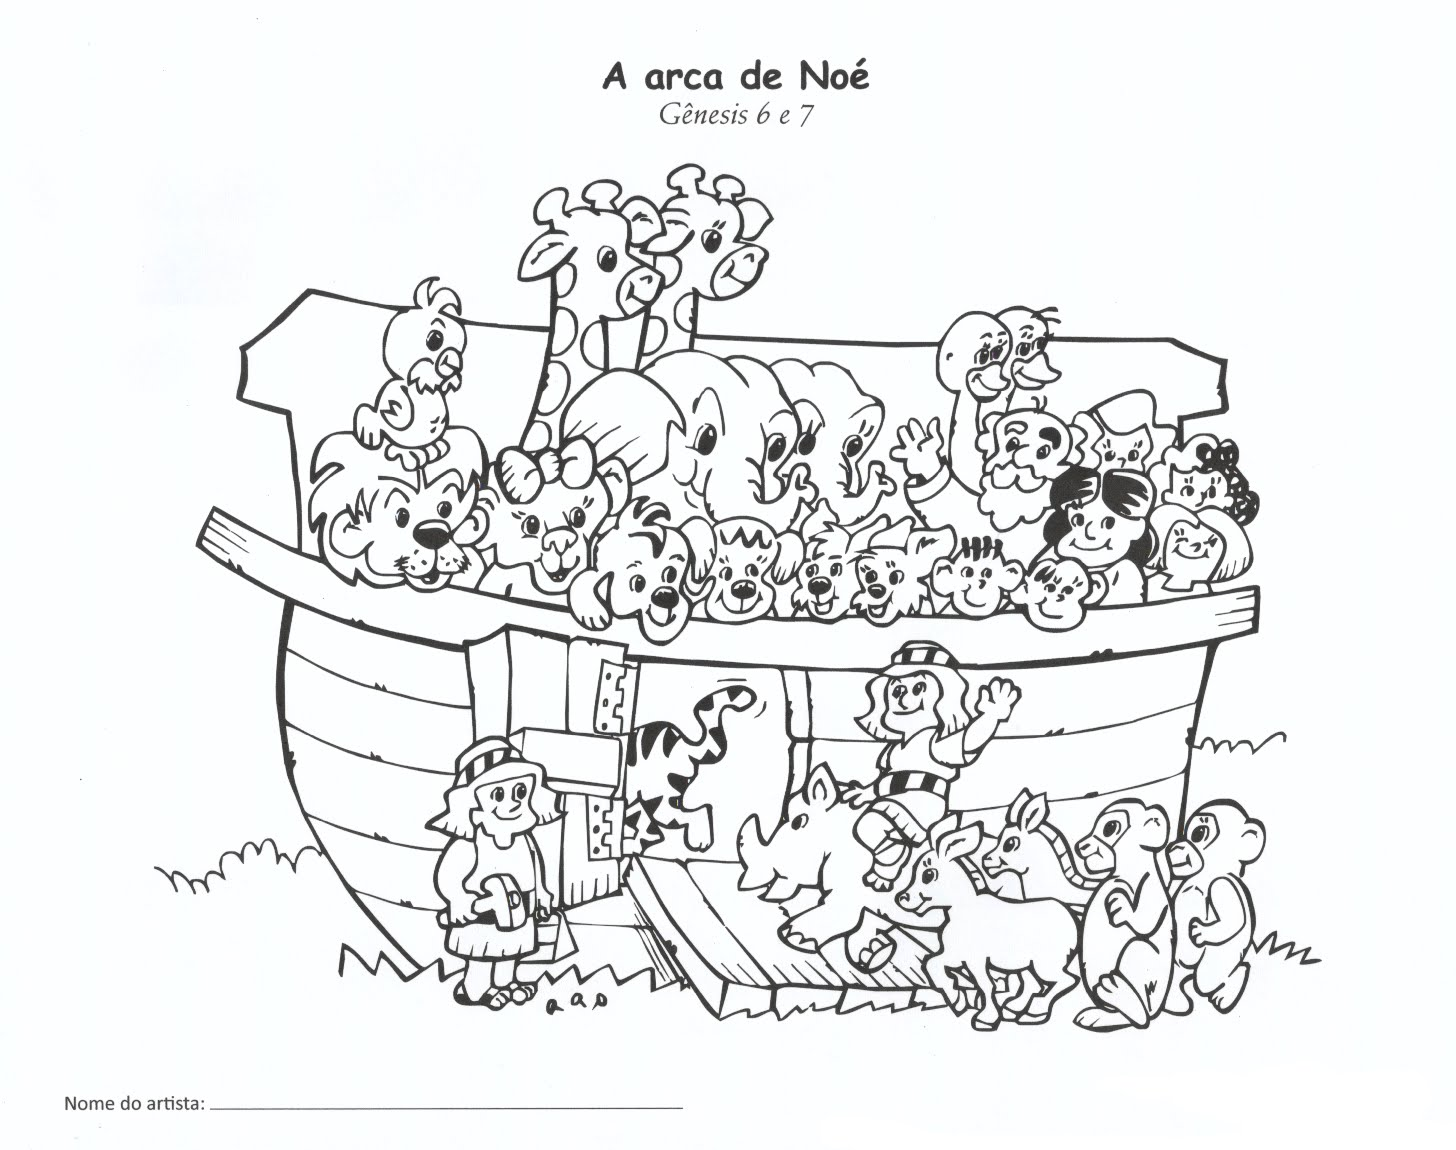 imagens para colorir gospel - Centenas de Desenhos bíblicos para colorir Ida Gospel